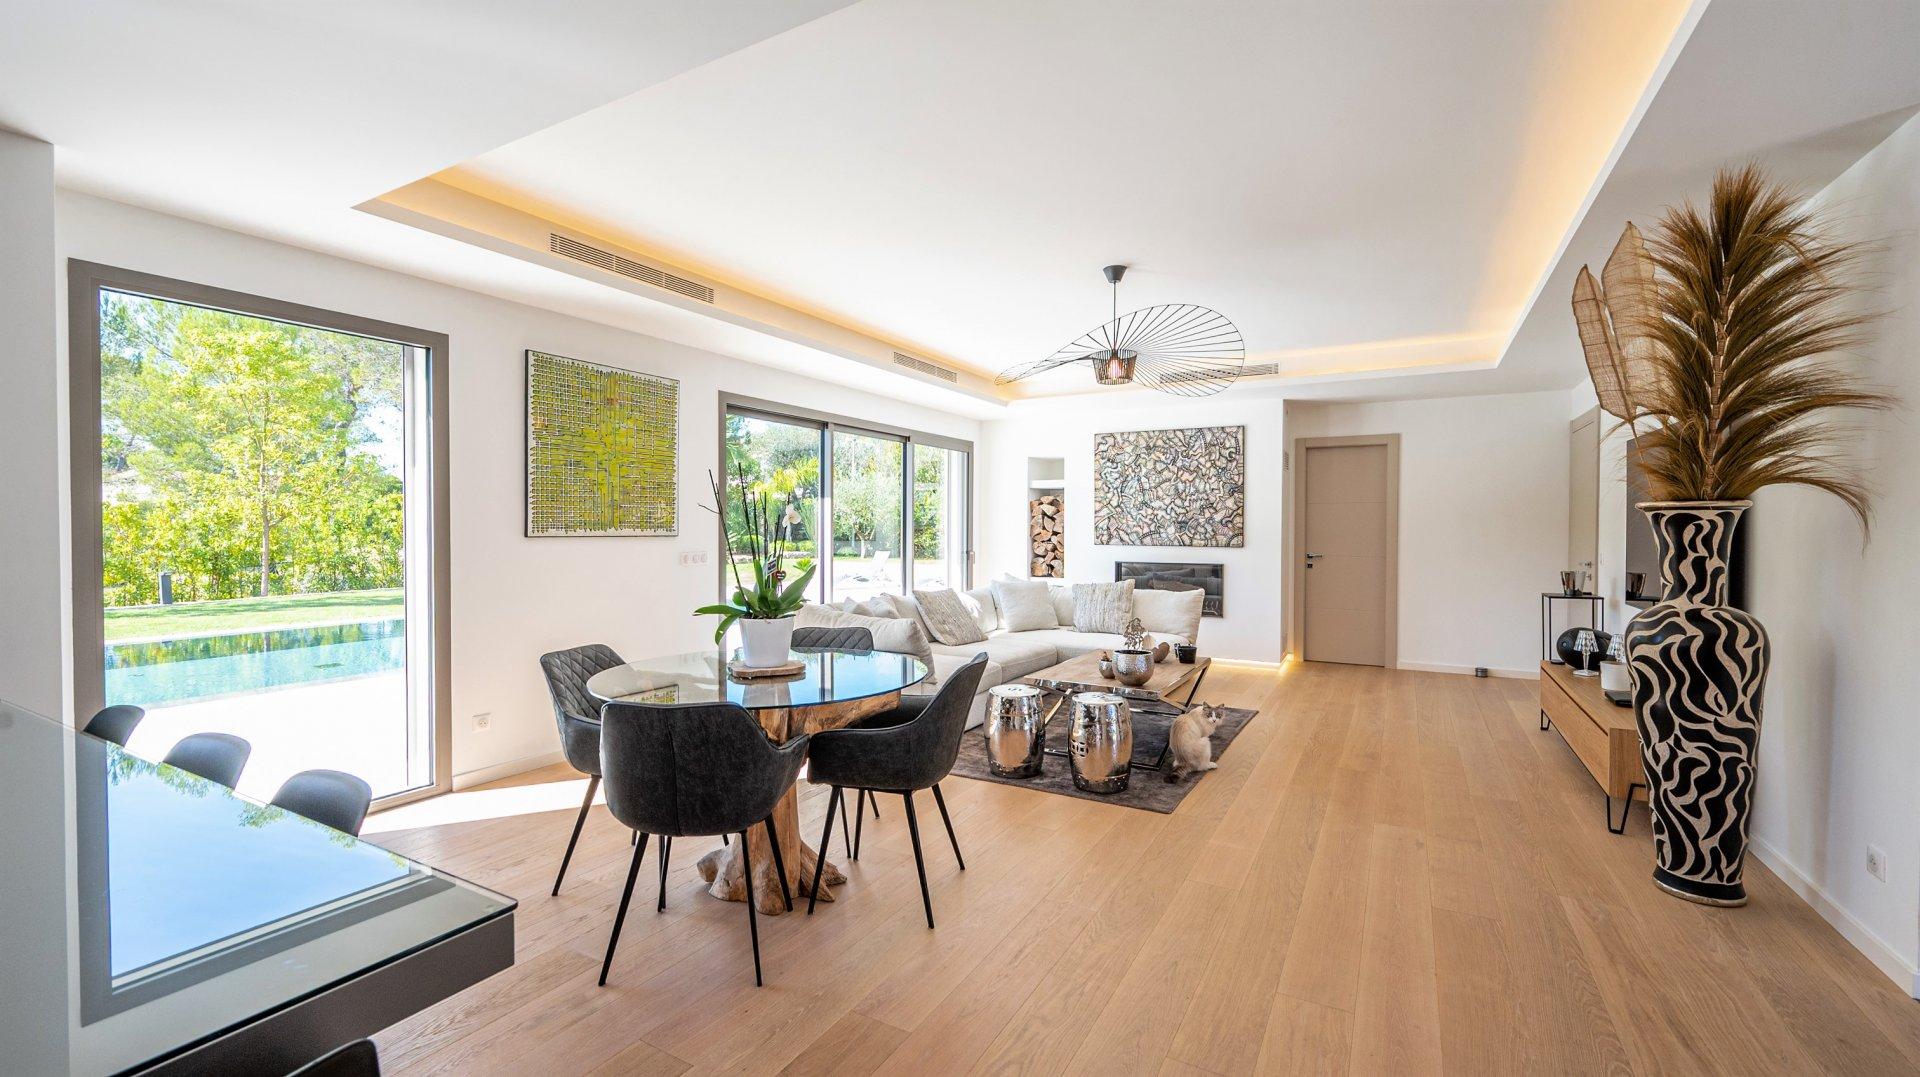 For sale - Contemporary Brand New Villa - MOUGINS